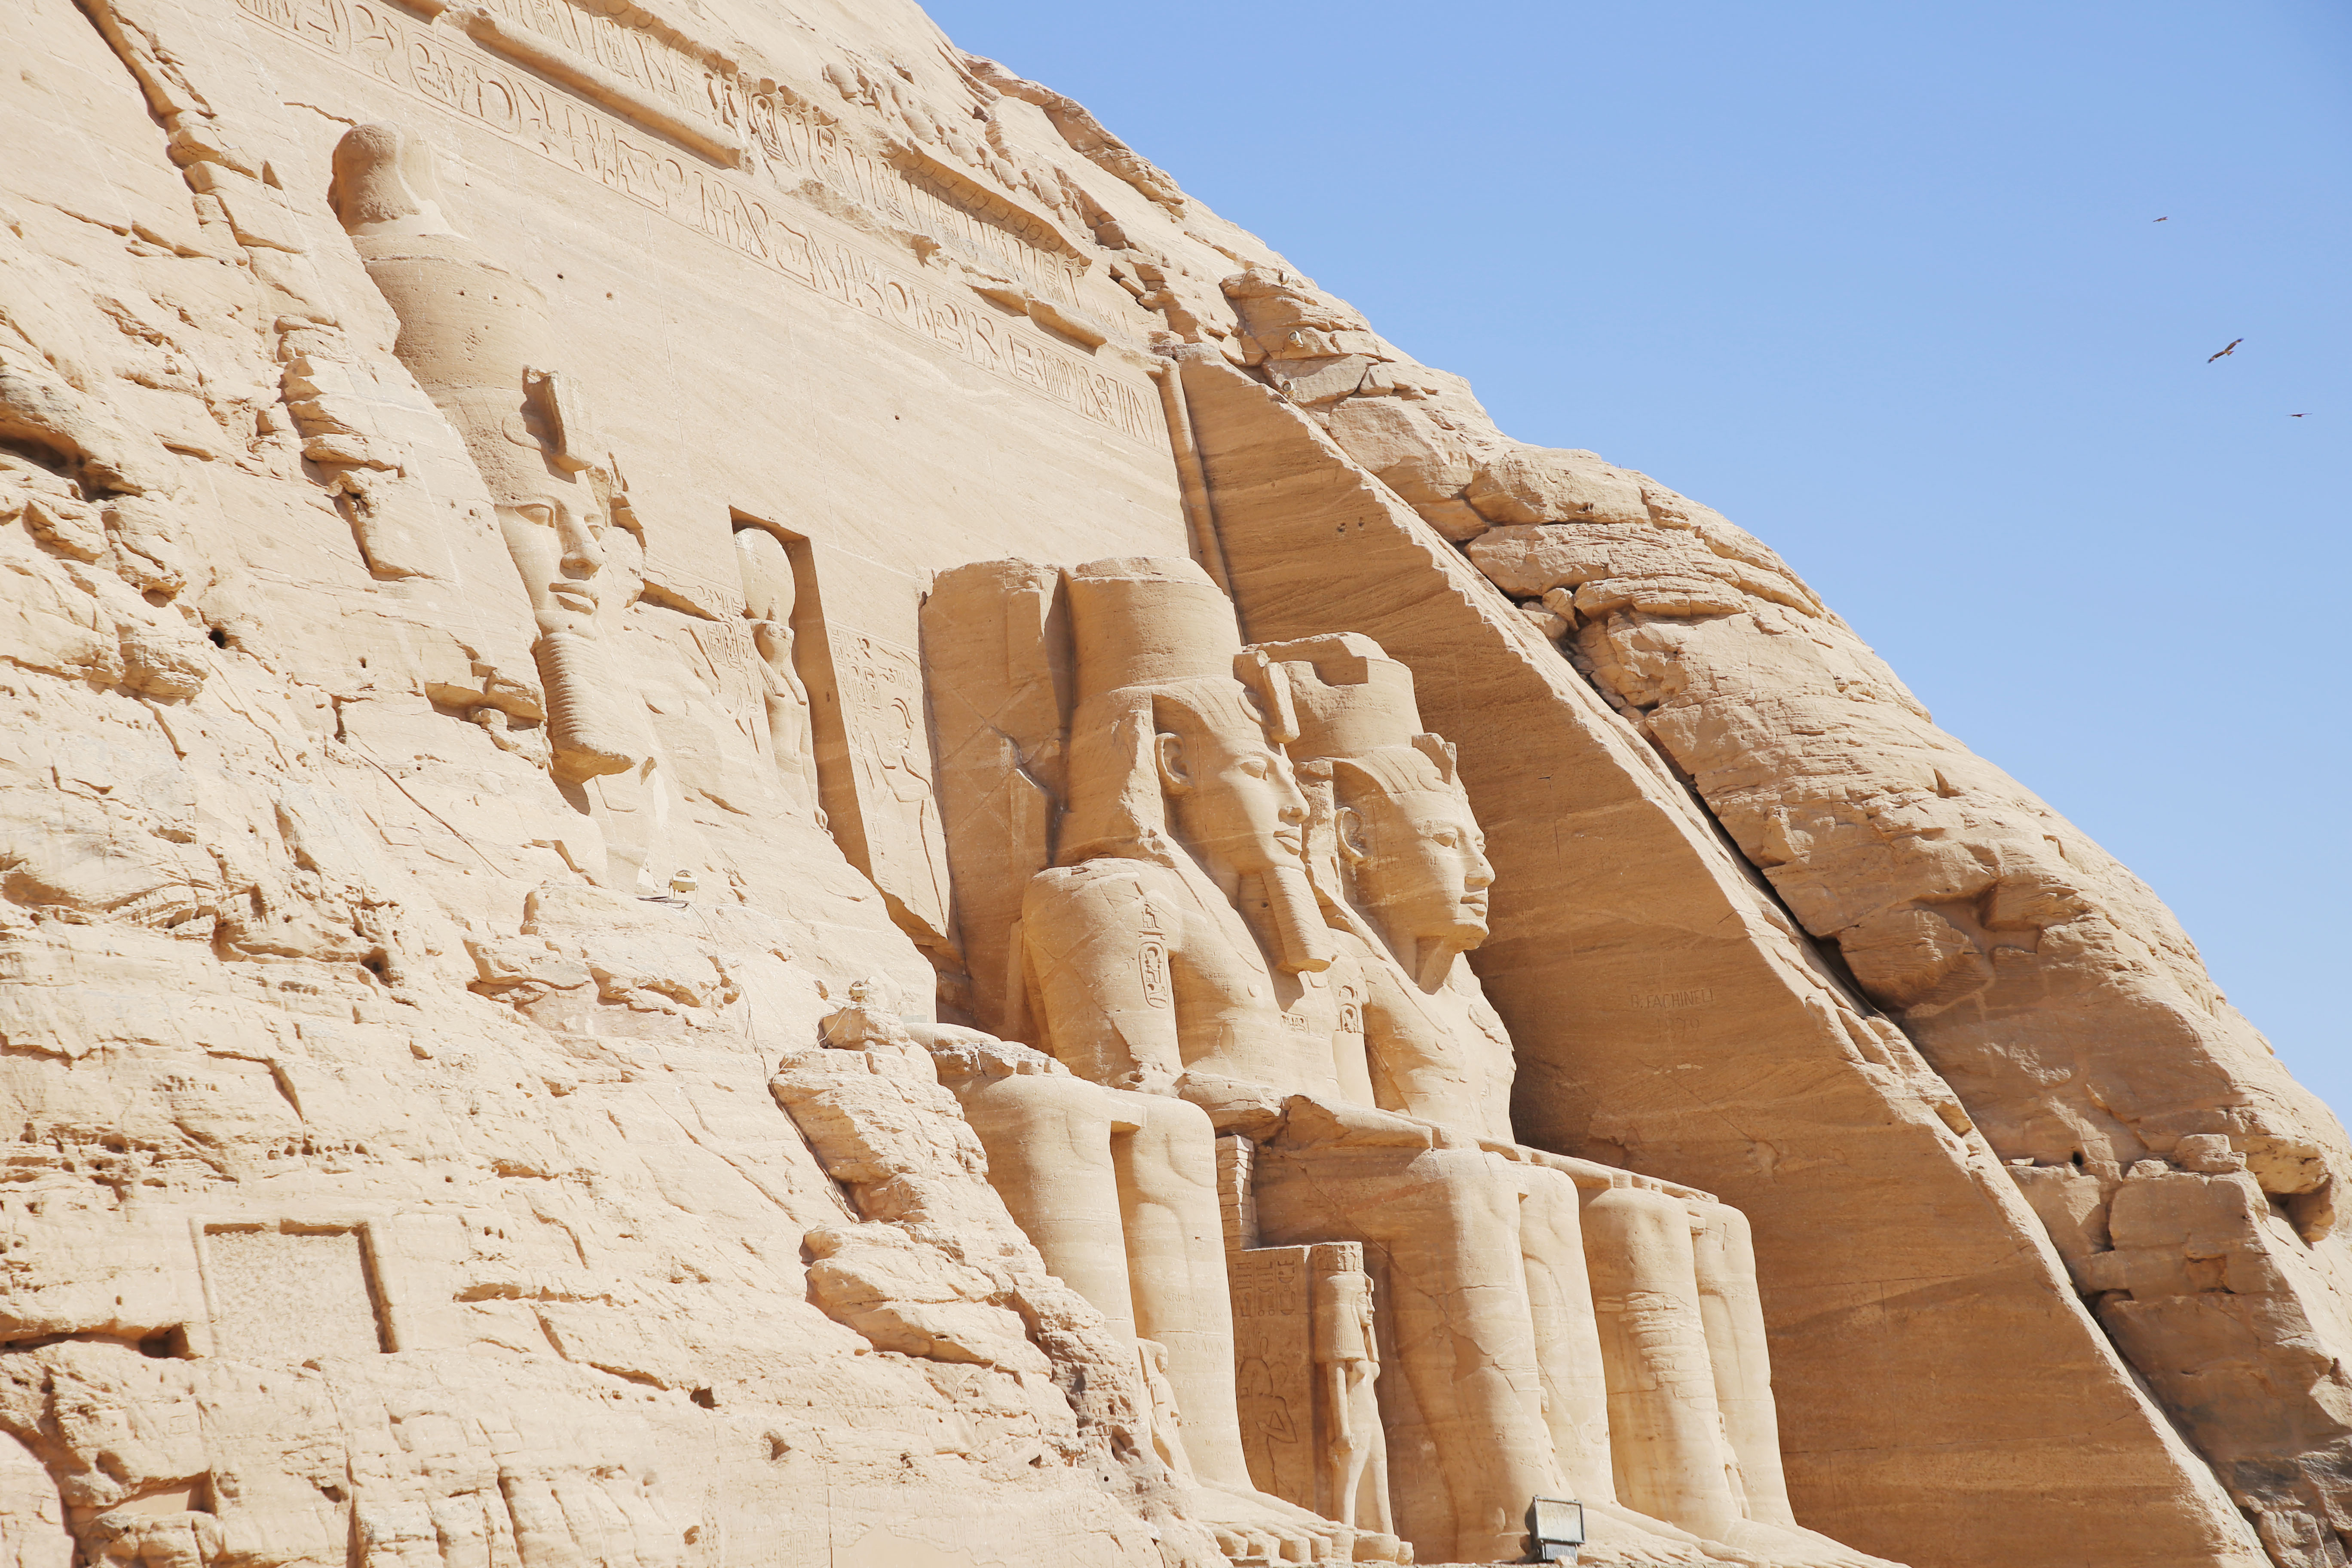 mia und ich blog Abu Simbel Statuen Ramses II Tempel  Ägypten Egypt